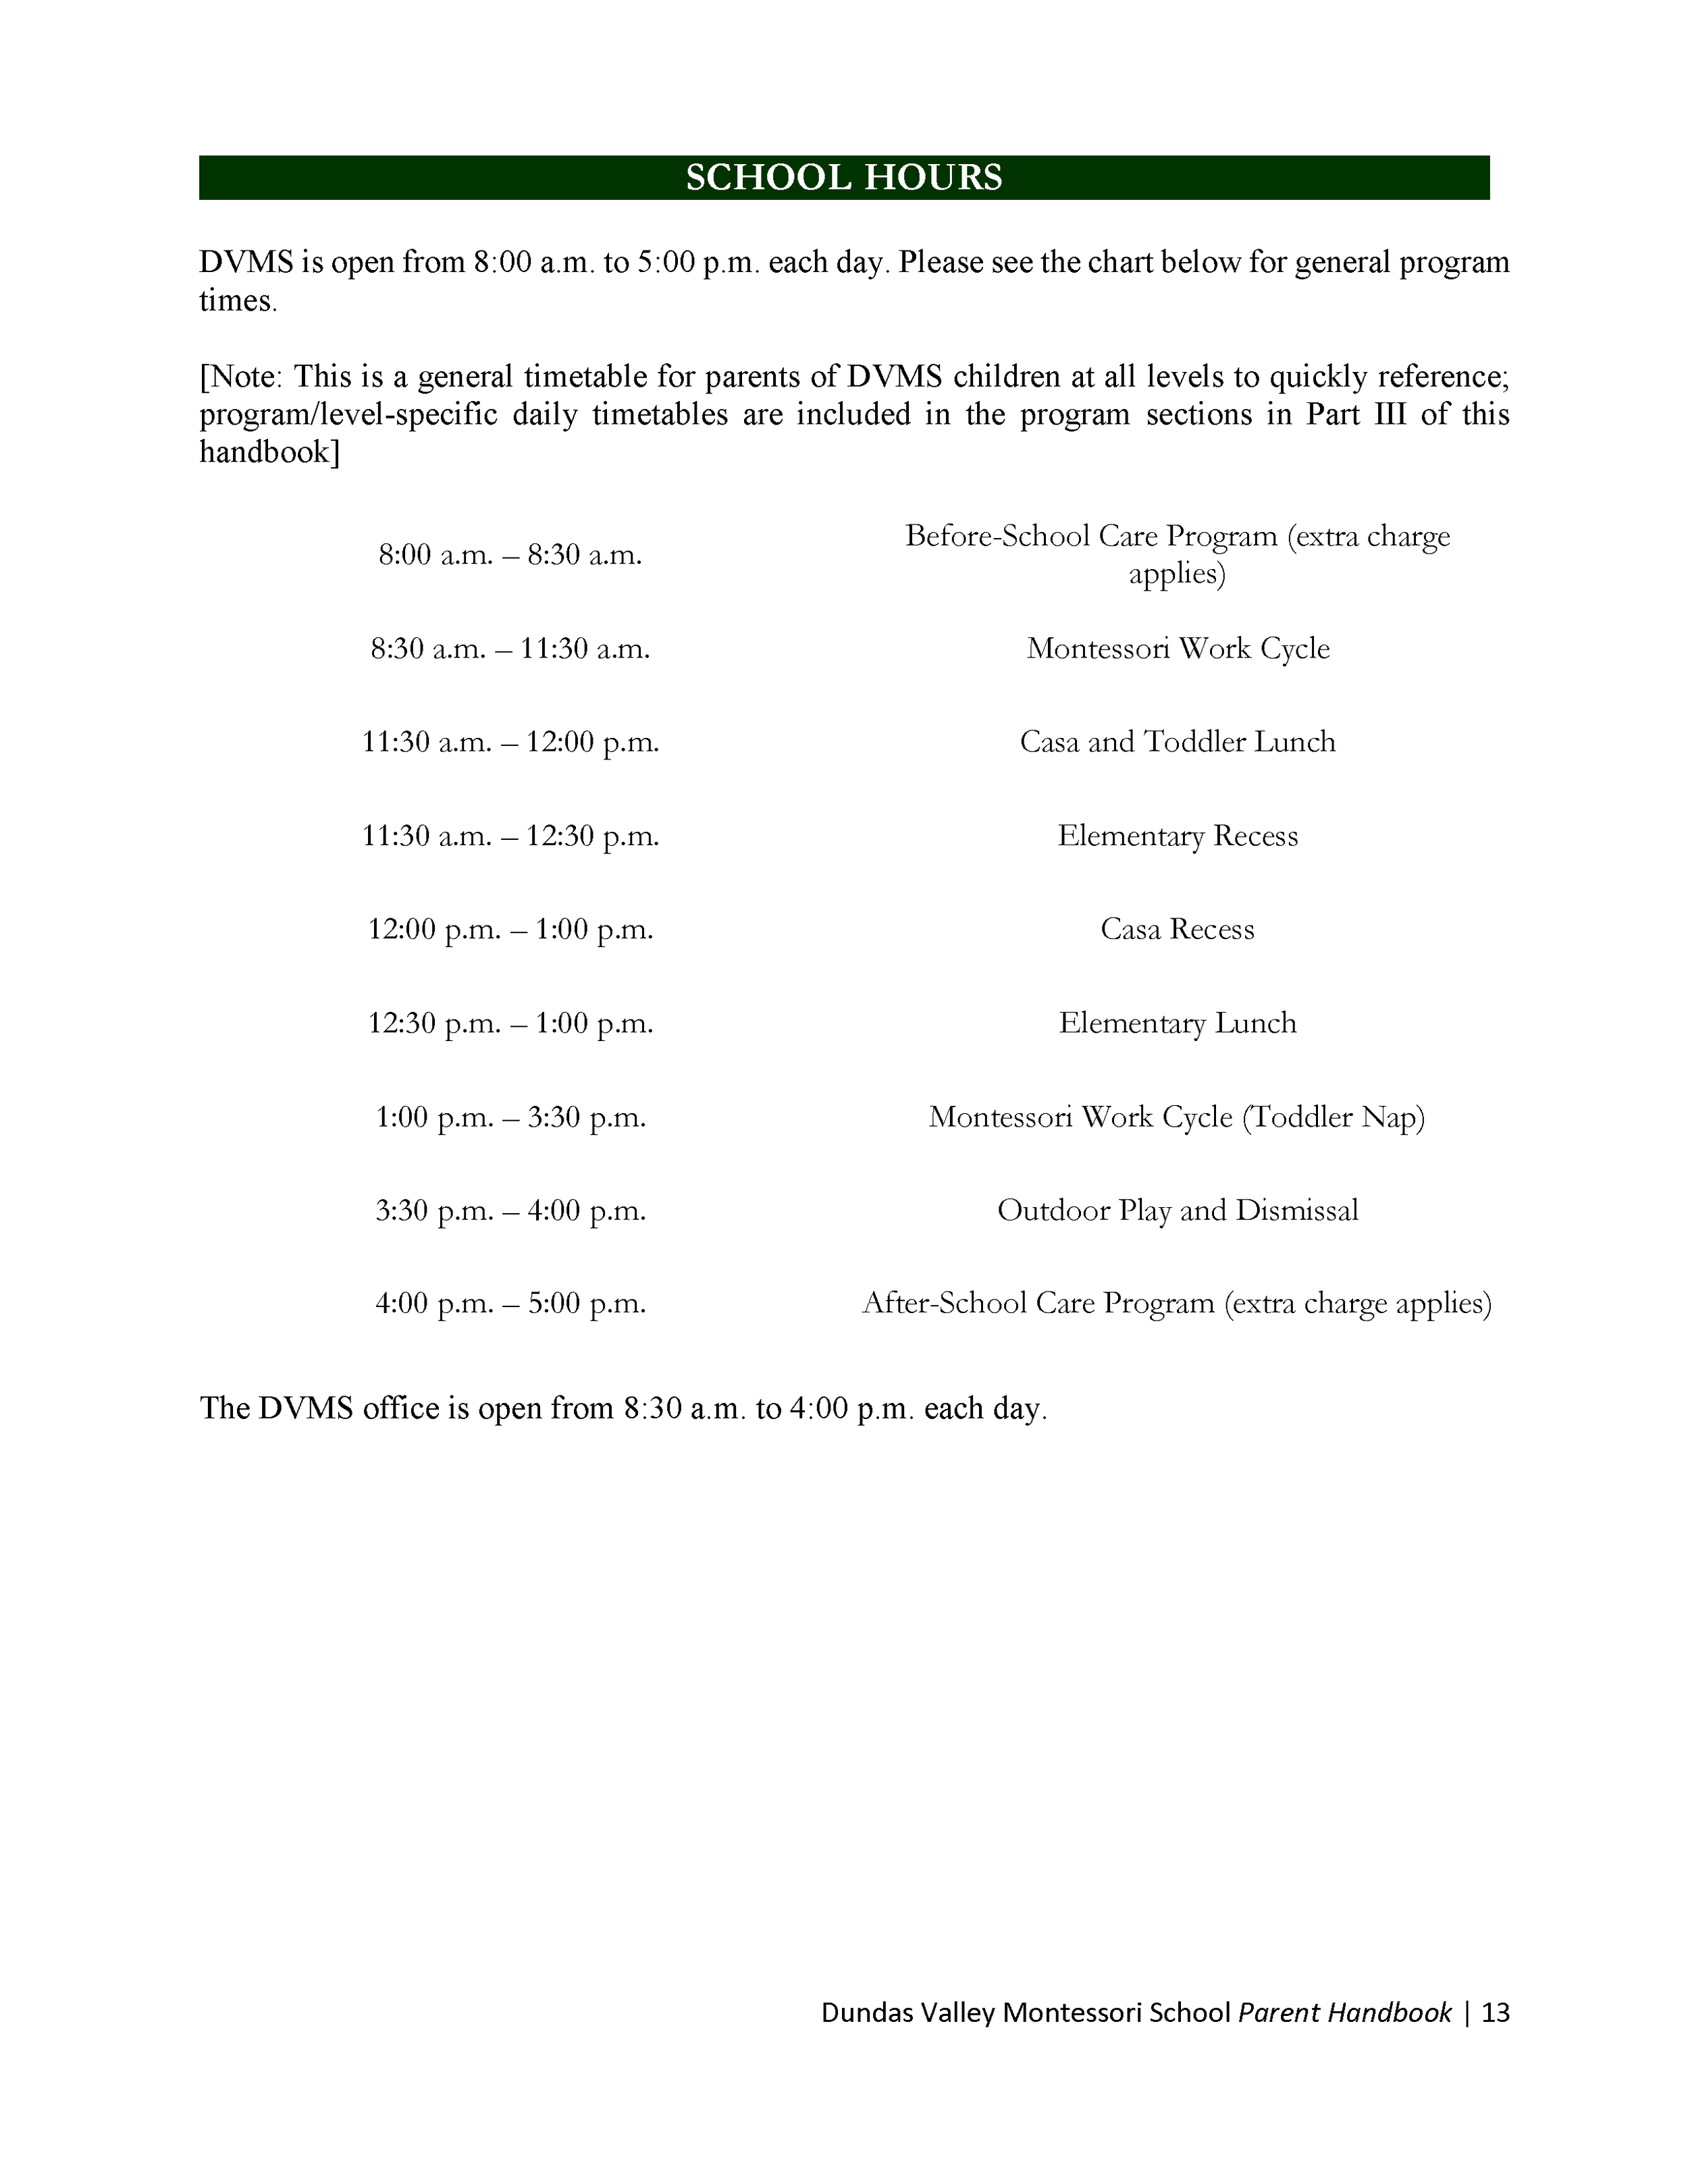 DVMS-Parent-Handbook-19-20_Page_015.png